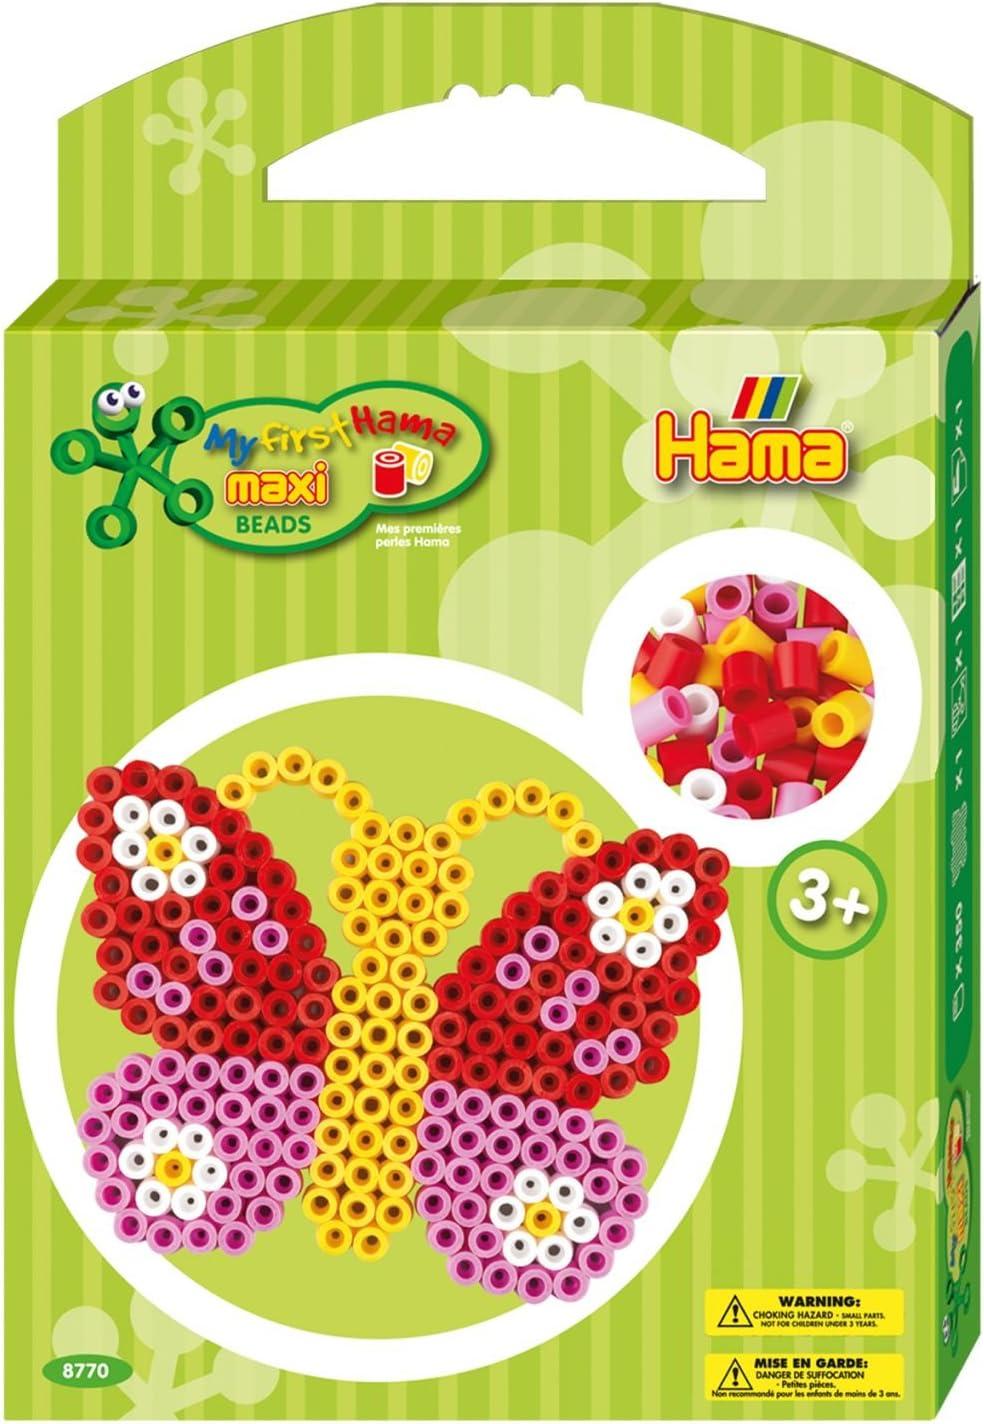 HAMA BEADS Hama Maxi Set Maxi Mariposa: Amazon.es: Juguetes y juegos